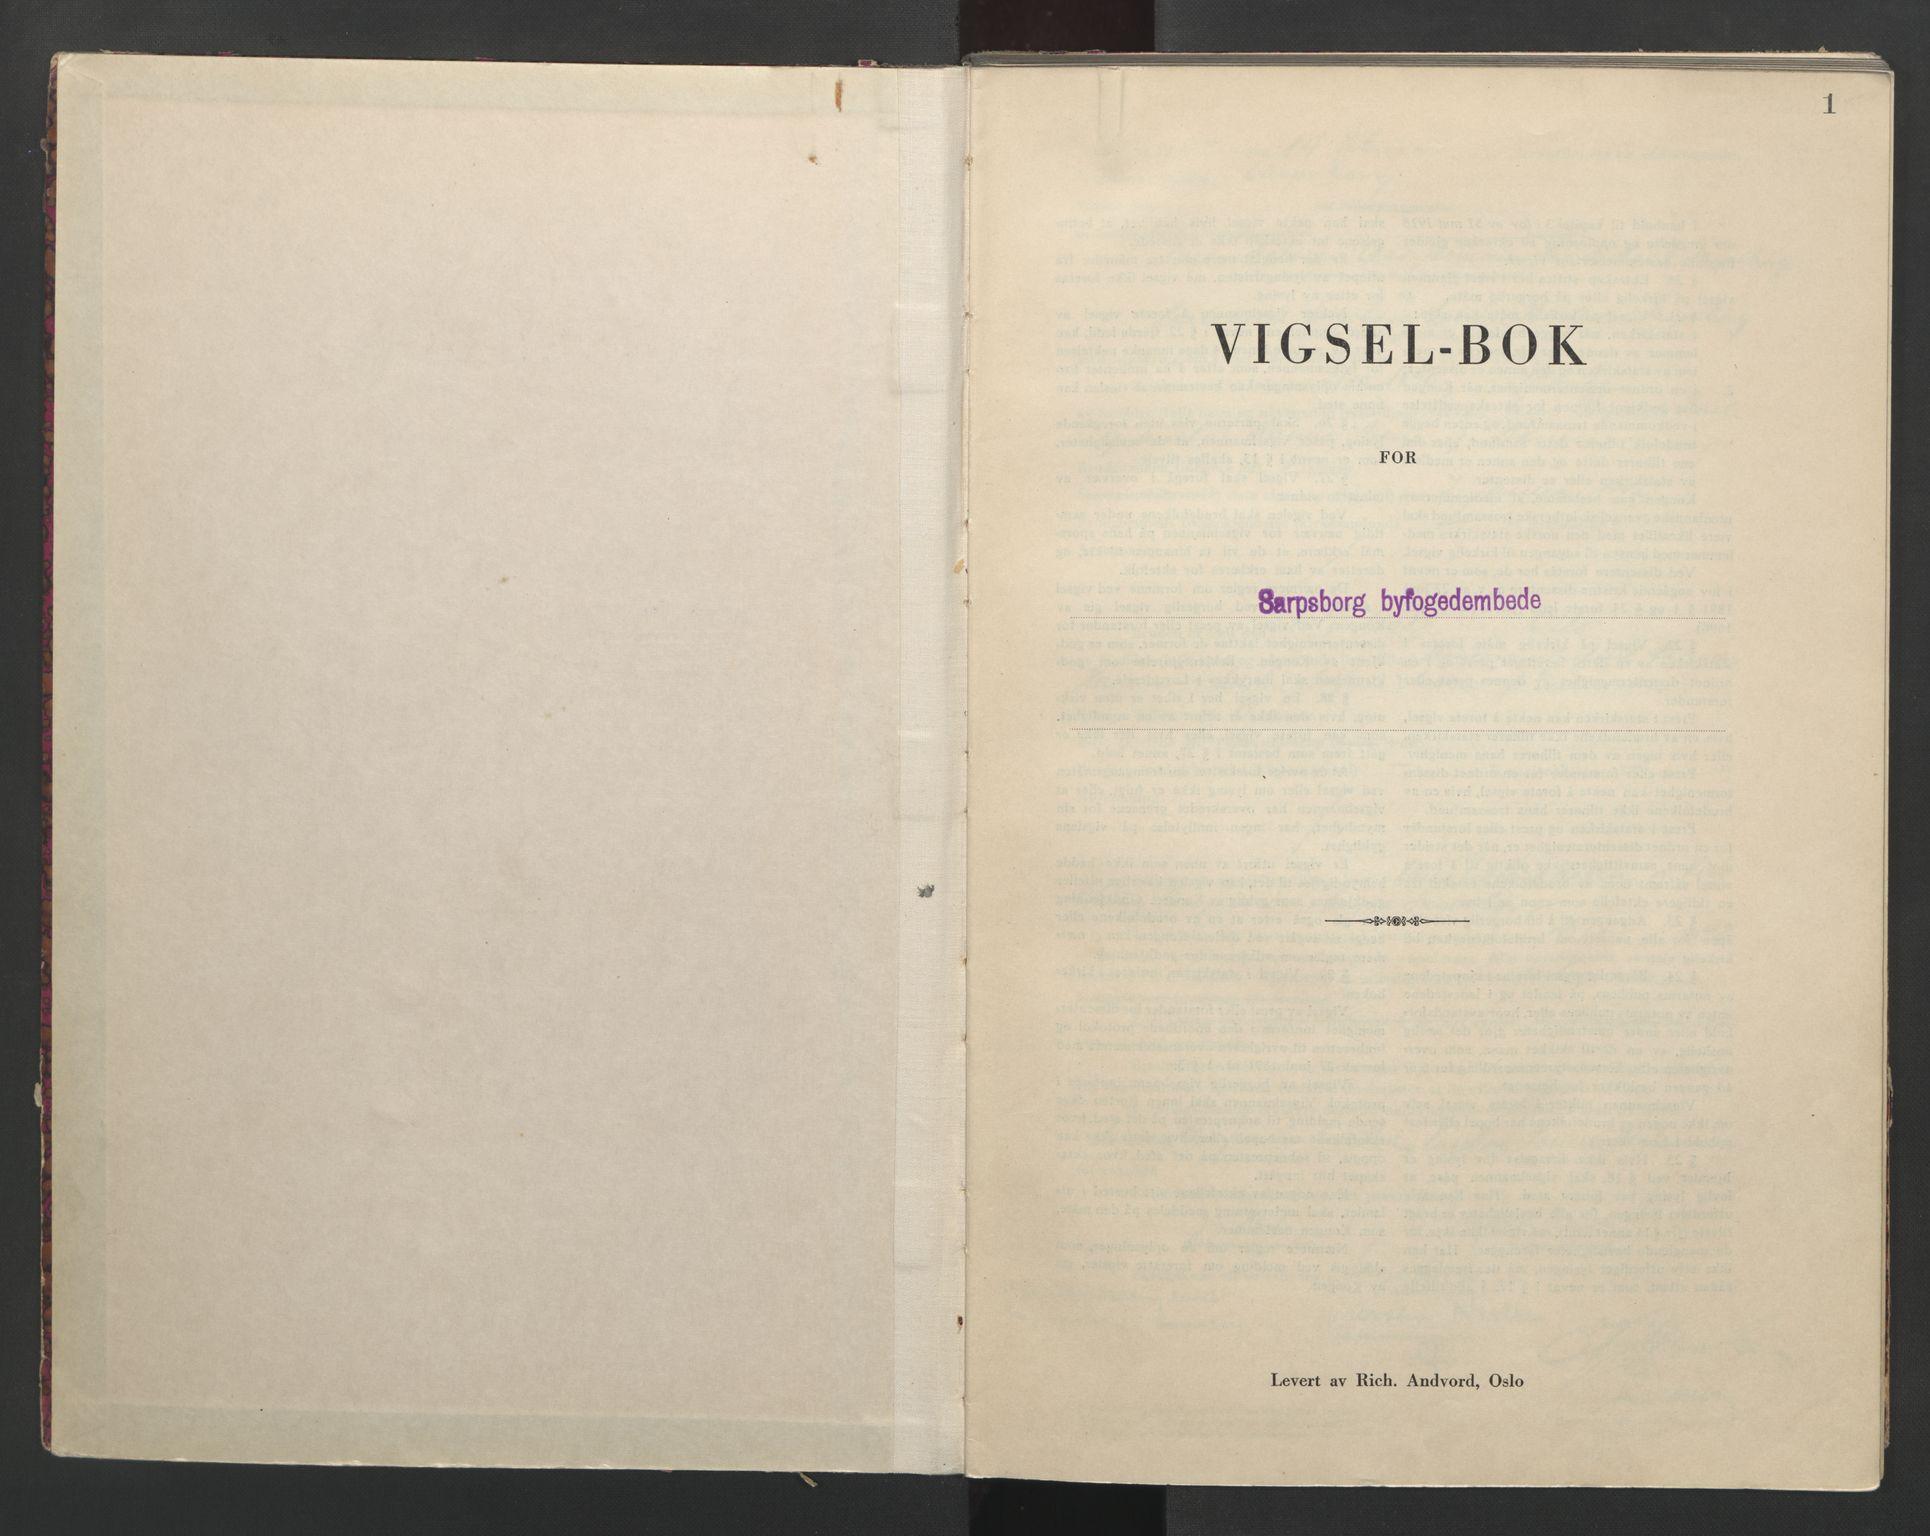 SAO, Sarpsborg byfogd, L/Lb/Lba/L0002: Vigselbok, 1942-1943, s. 1